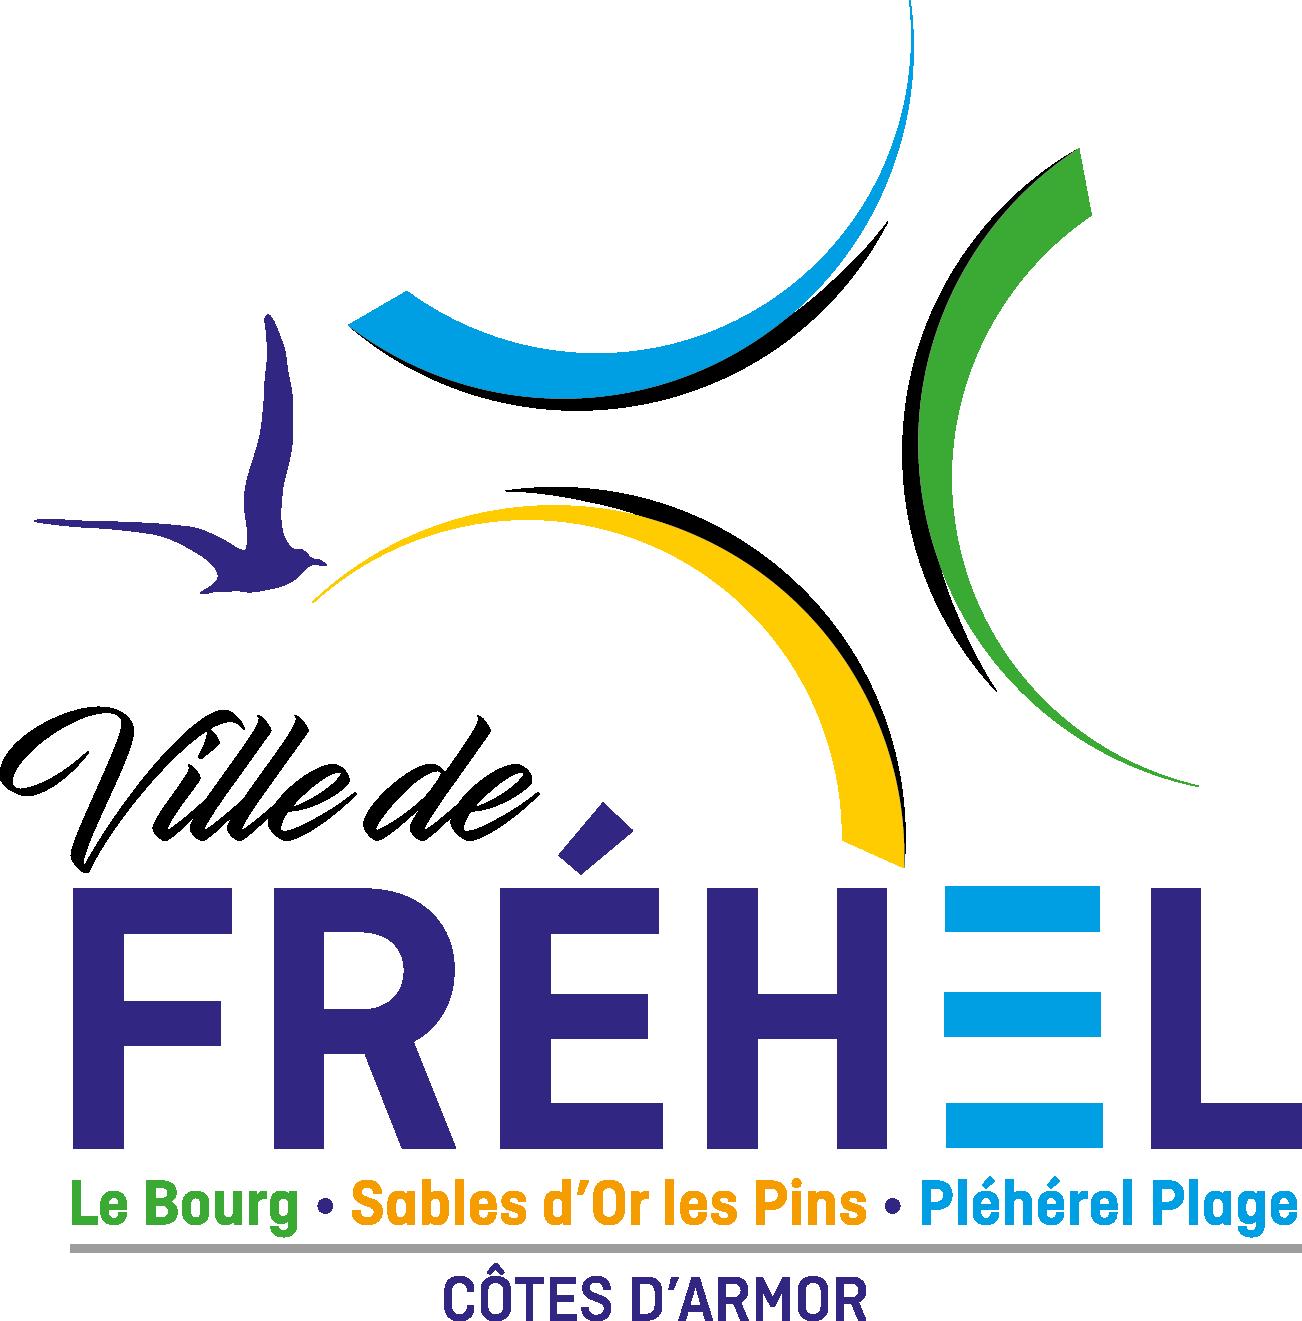 Mairie de Fréhel